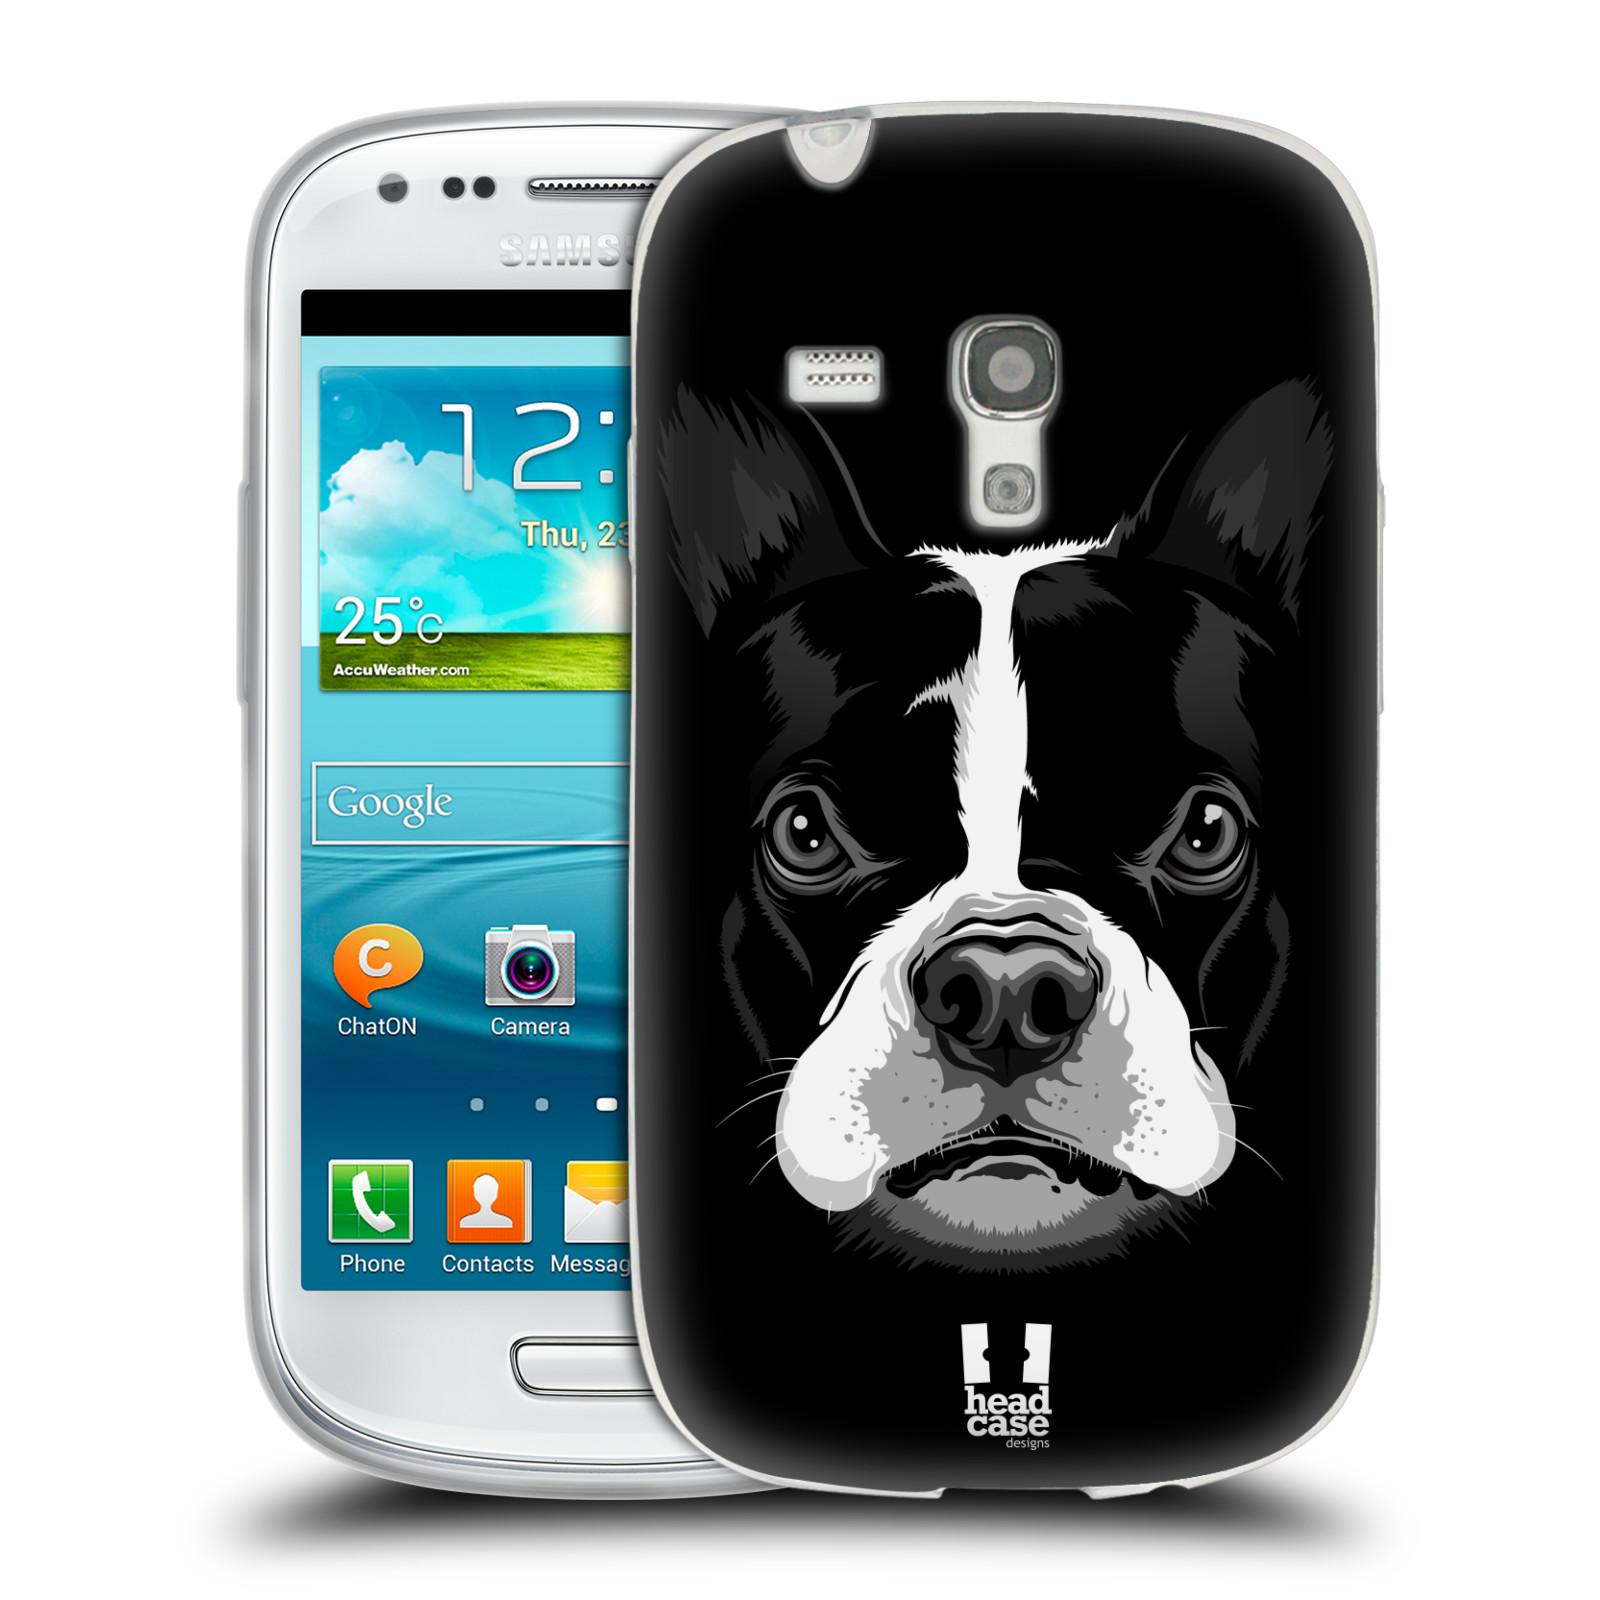 HEAD CASE silikonový obal na mobil Samsung Galaxy S3 MINI i8190 vzor Zvíře kreslená tvář 2 buldok